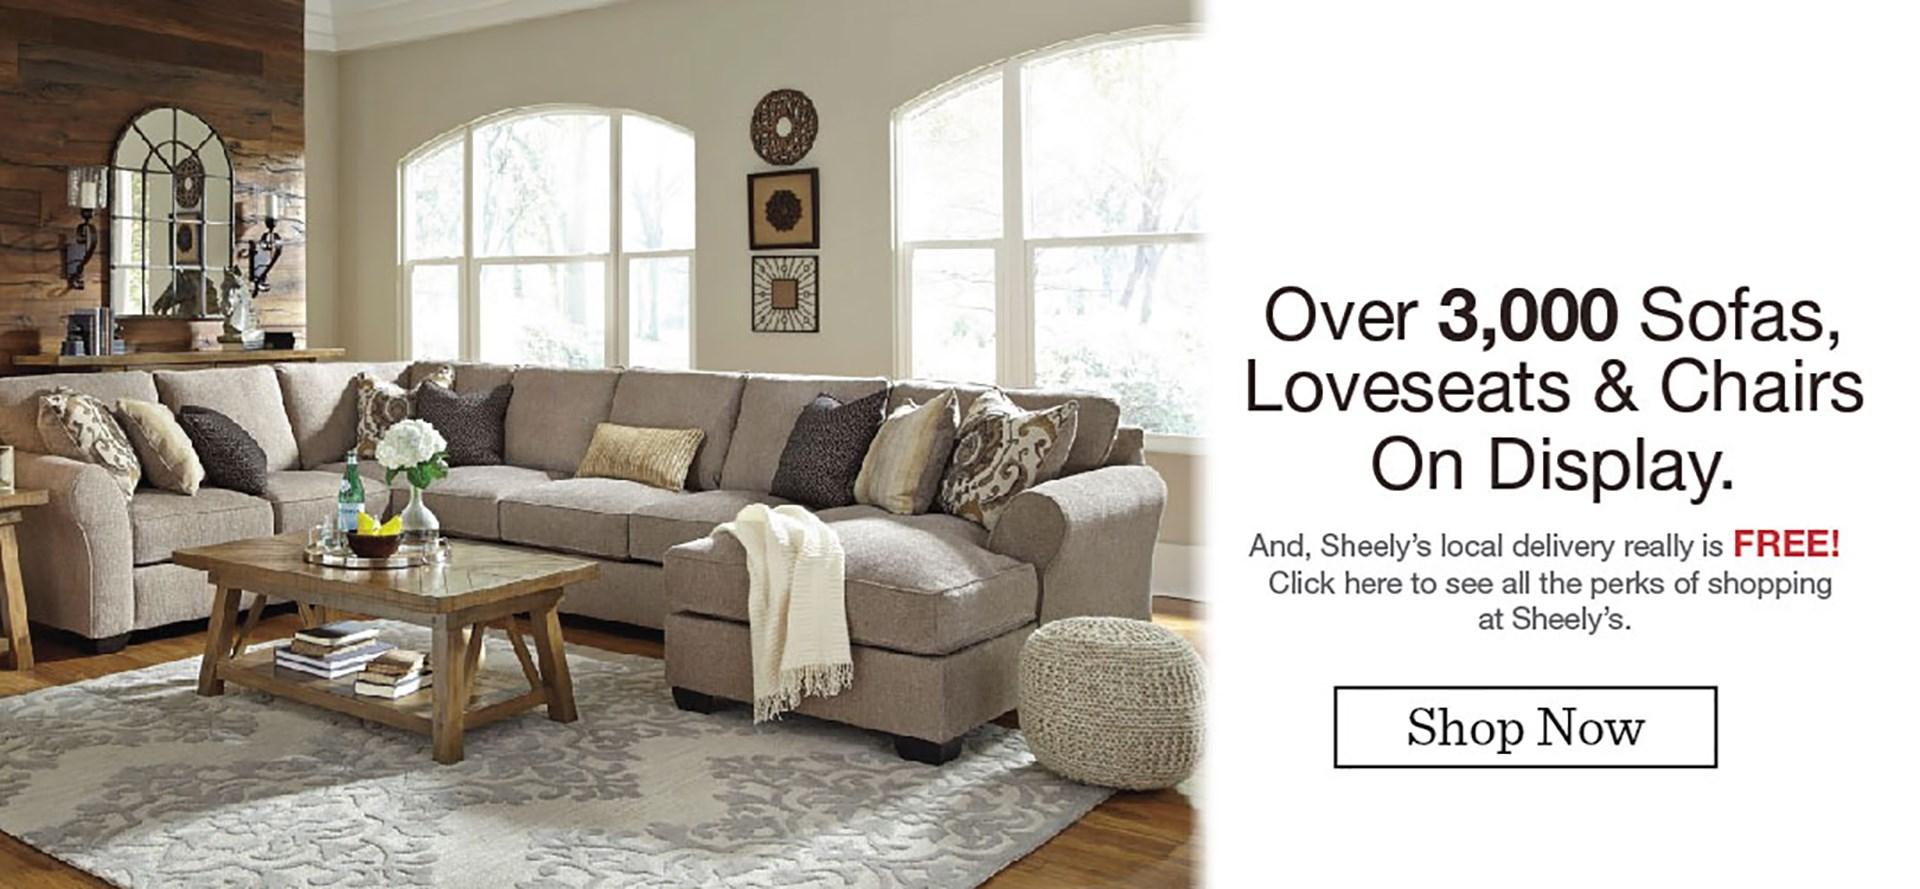 Sofas, Loveseats